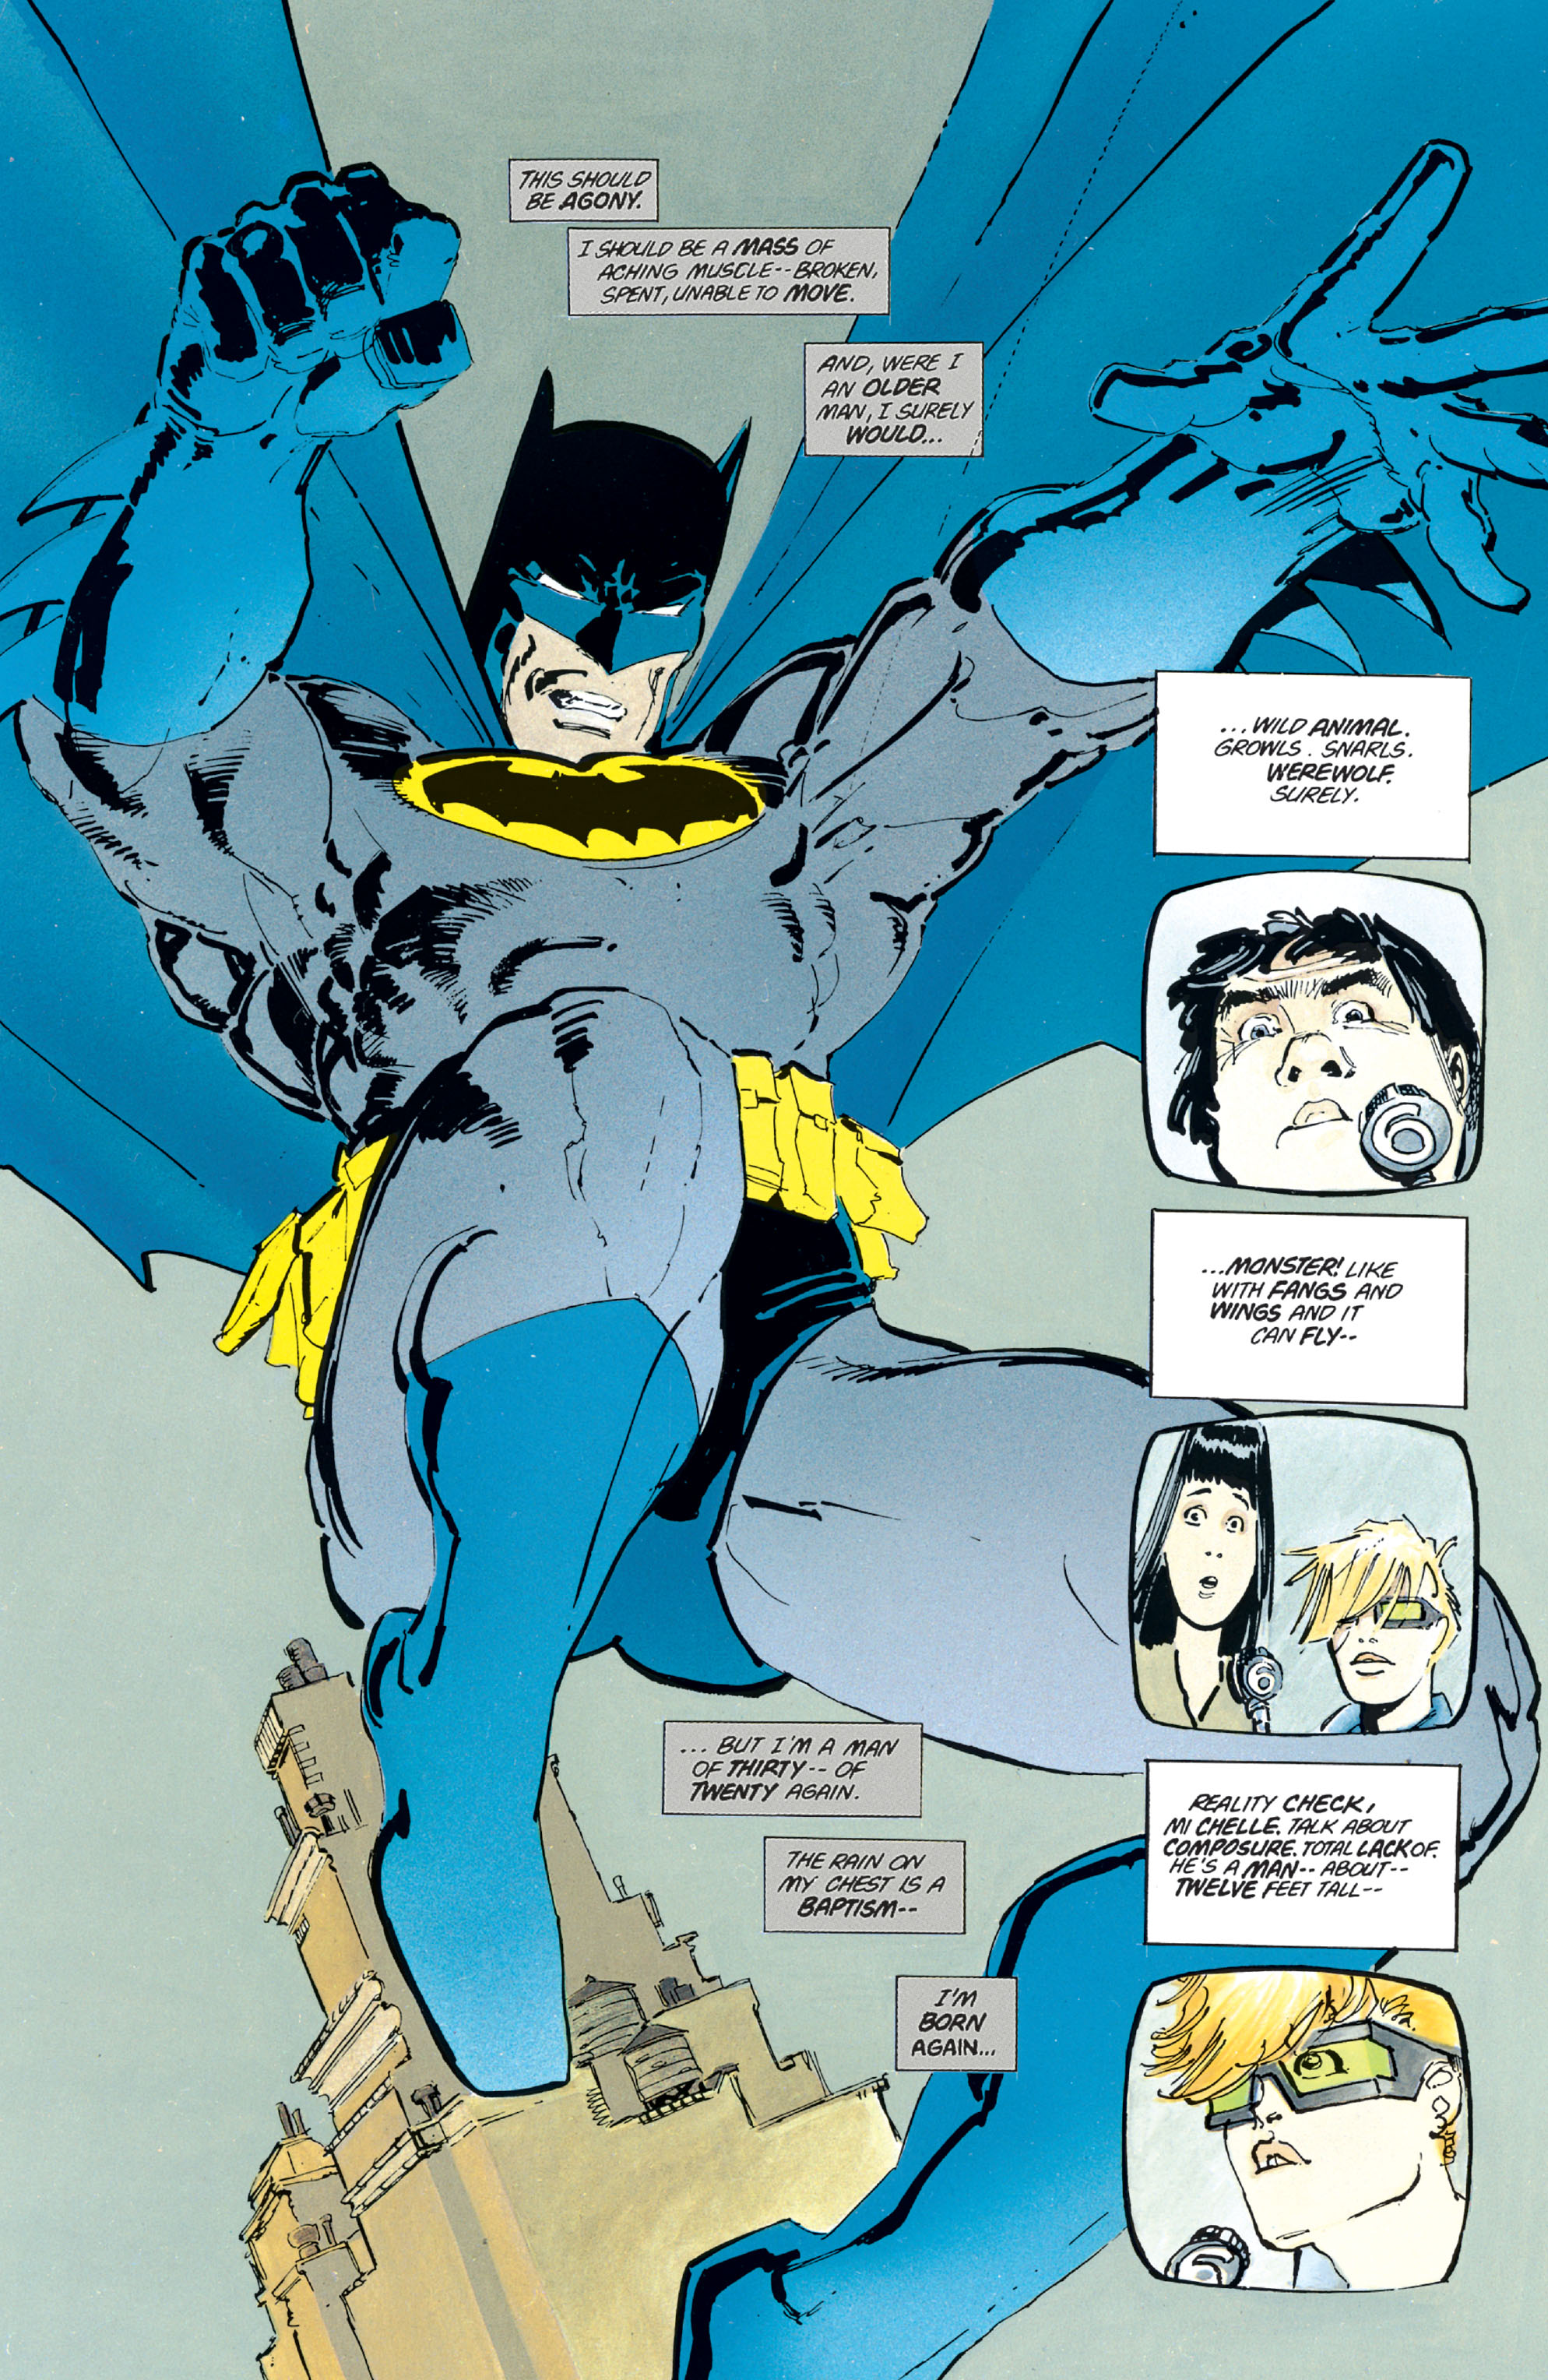 Psychology of Bruce Wayne 8bAx9KknSA3DWihW8pB01wvMGUGxc1ny34msnYEVPVDhd1R1l16_RwVV1gRWRaoSbbfV8686t8NI=s0